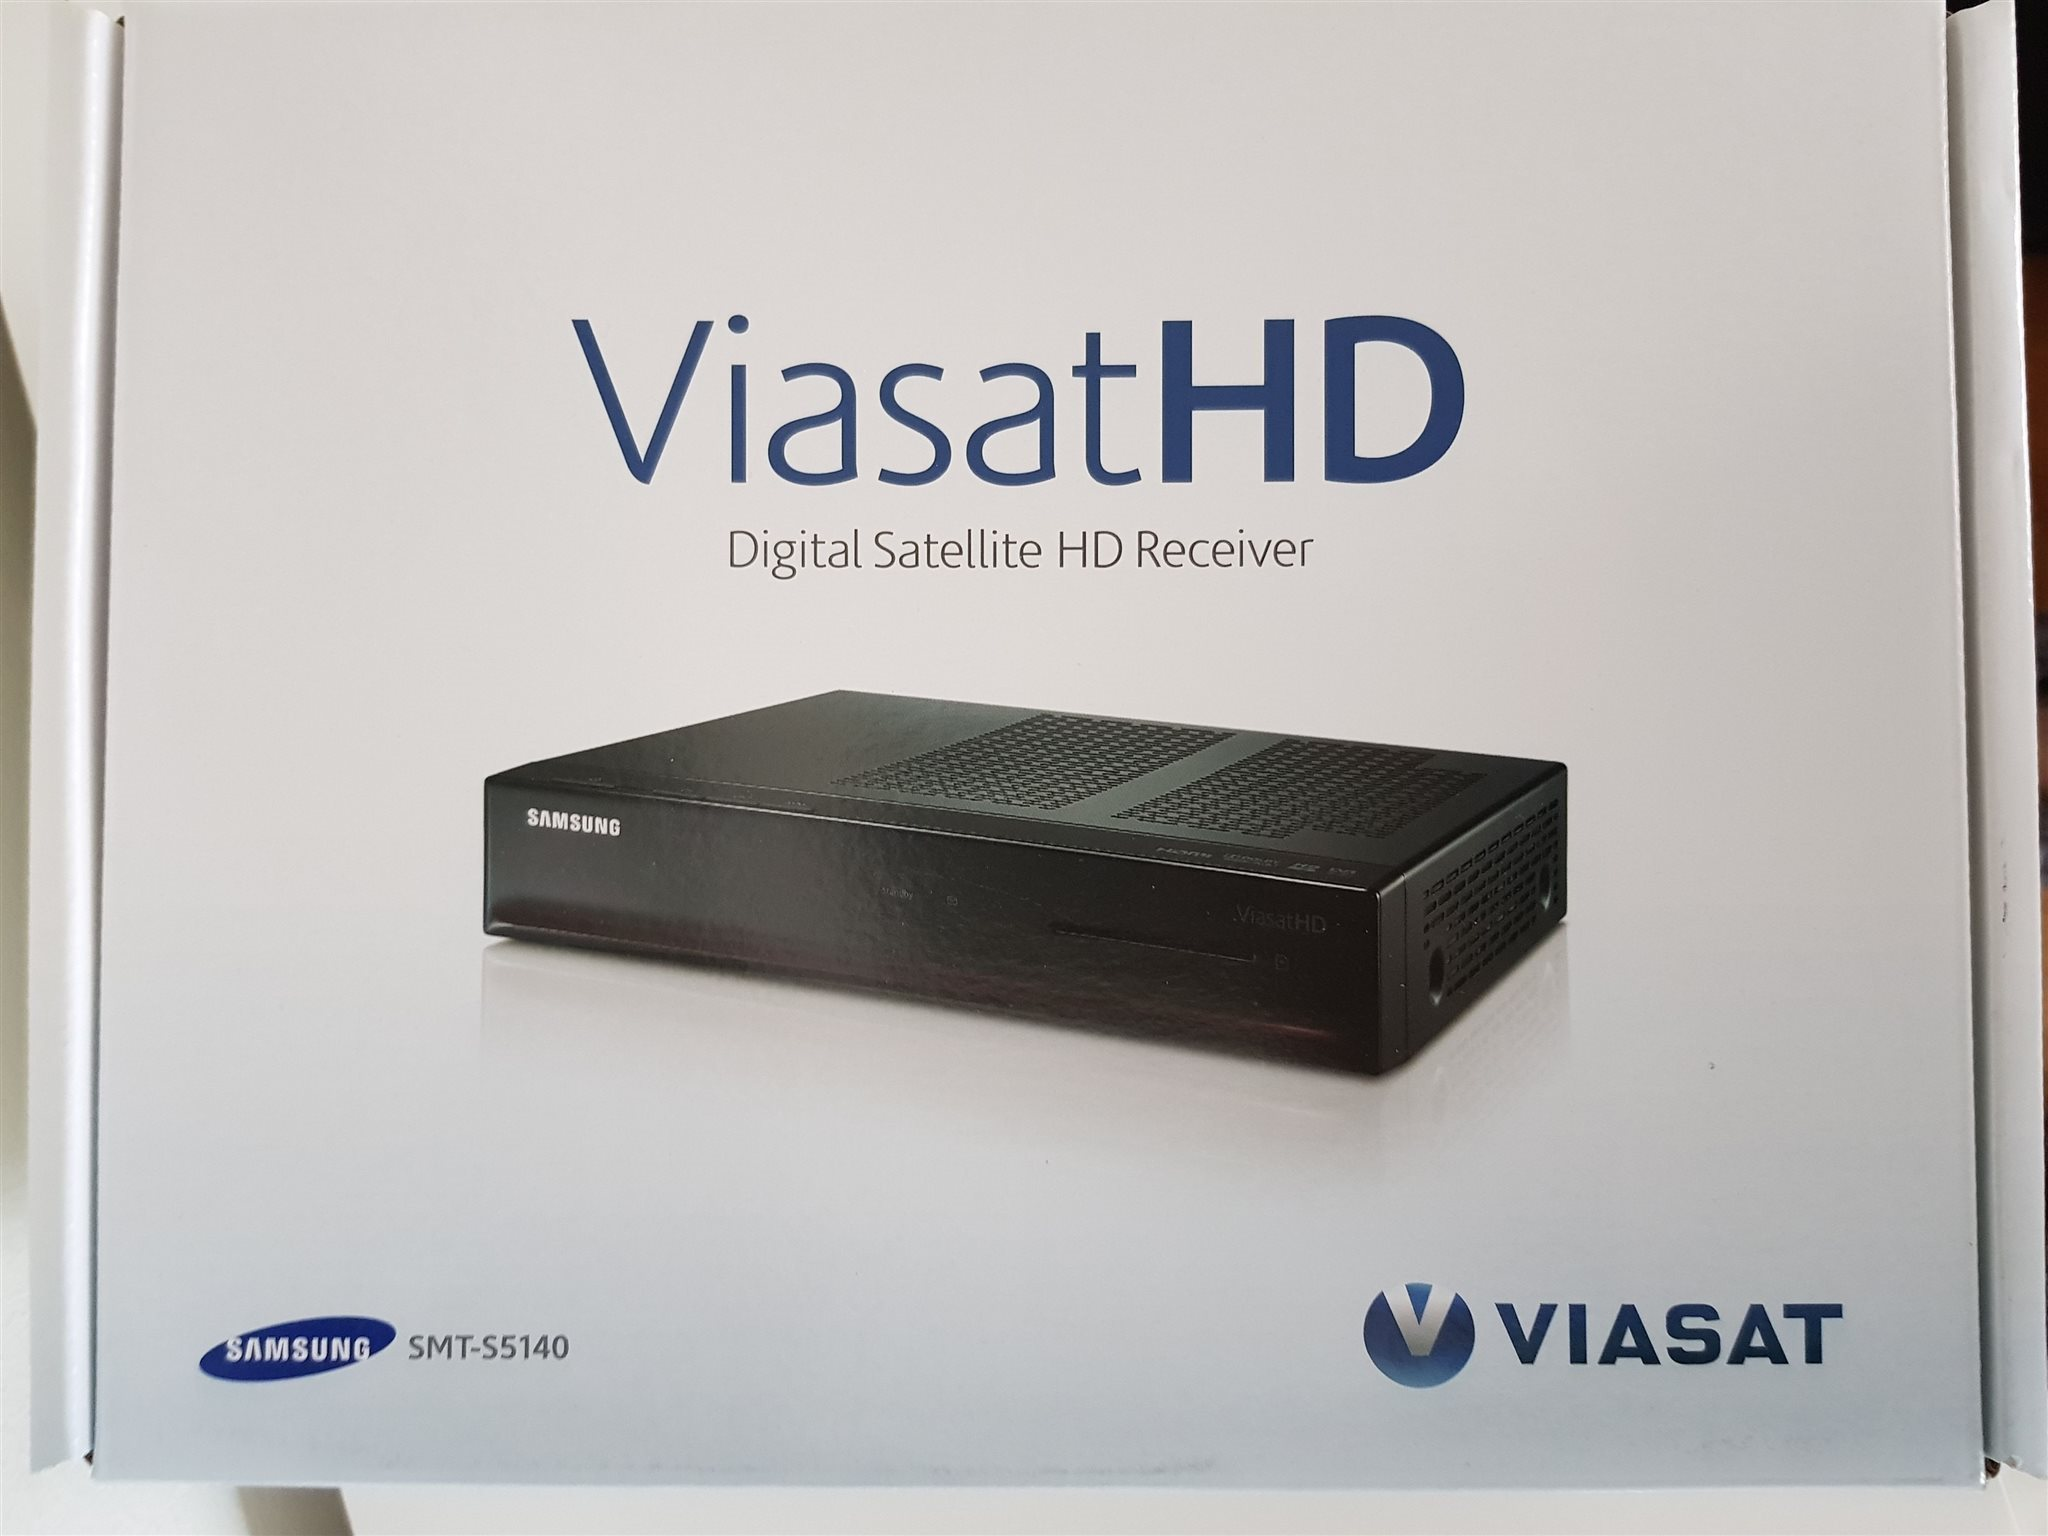 viasat hd box wifi